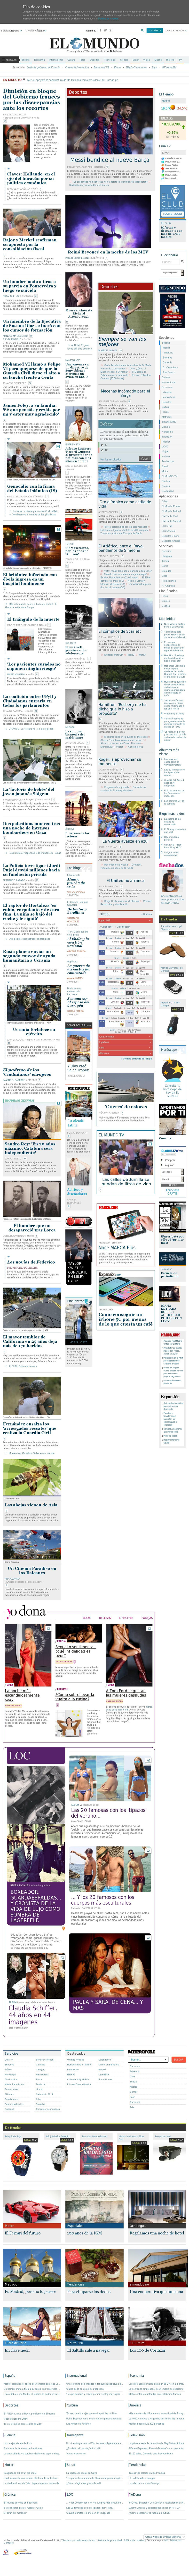 El Mundo at Monday Aug. 25, 2014, 10:13 a.m. UTC